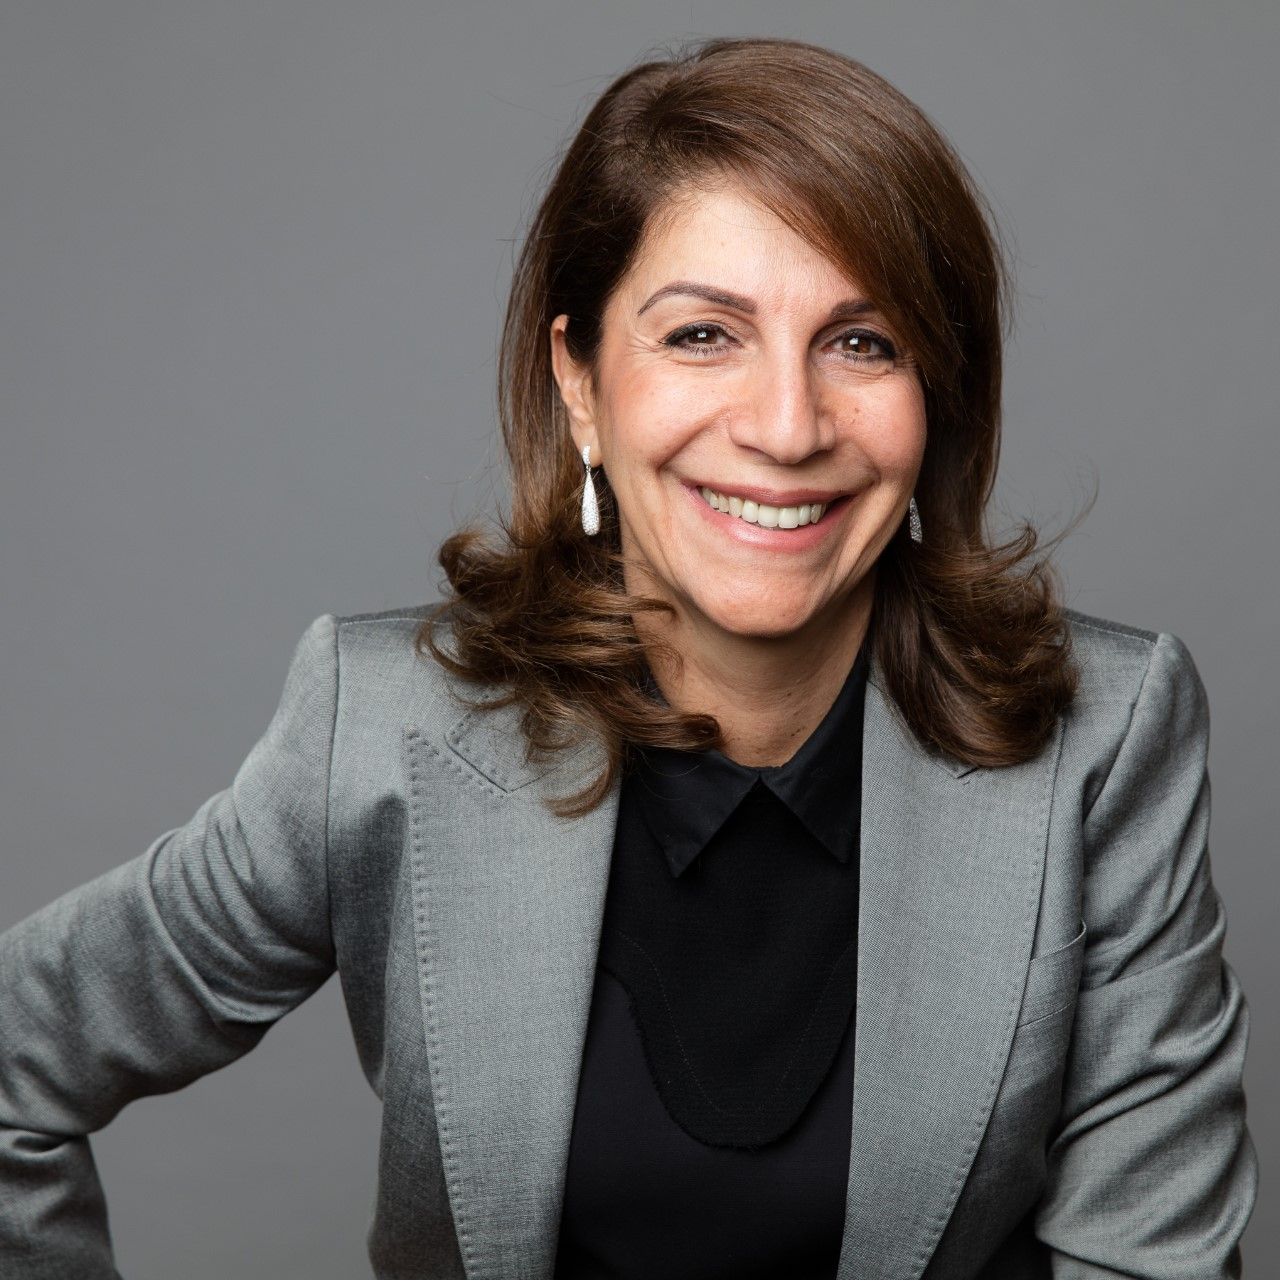 Nathalie Mréjen